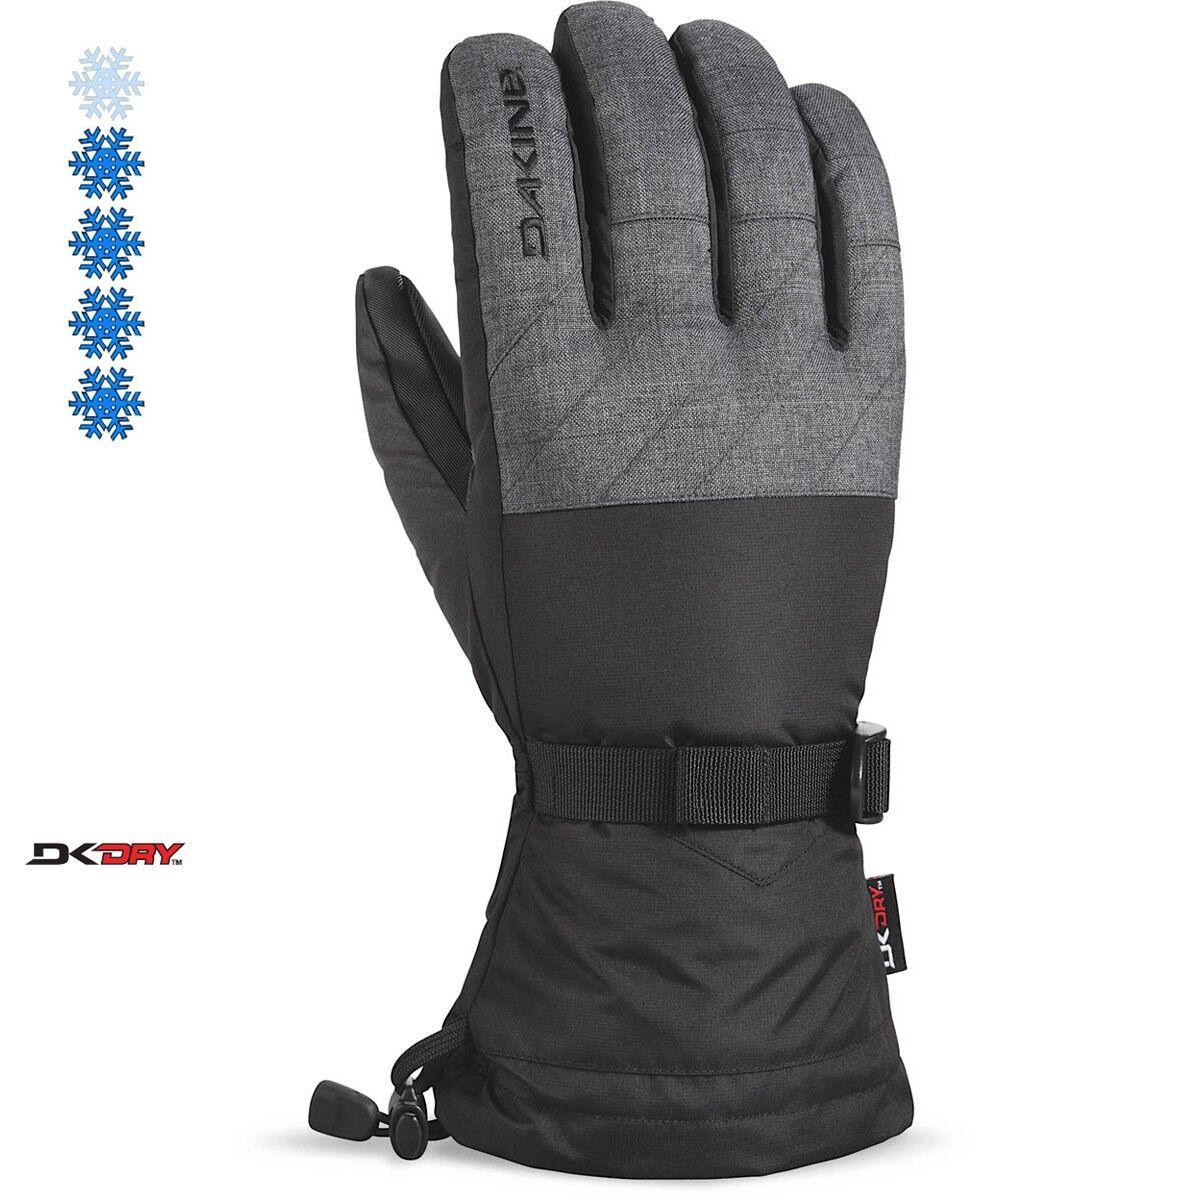 Dakine Talon Glove Ski- / Snowboard Guanti Carbon